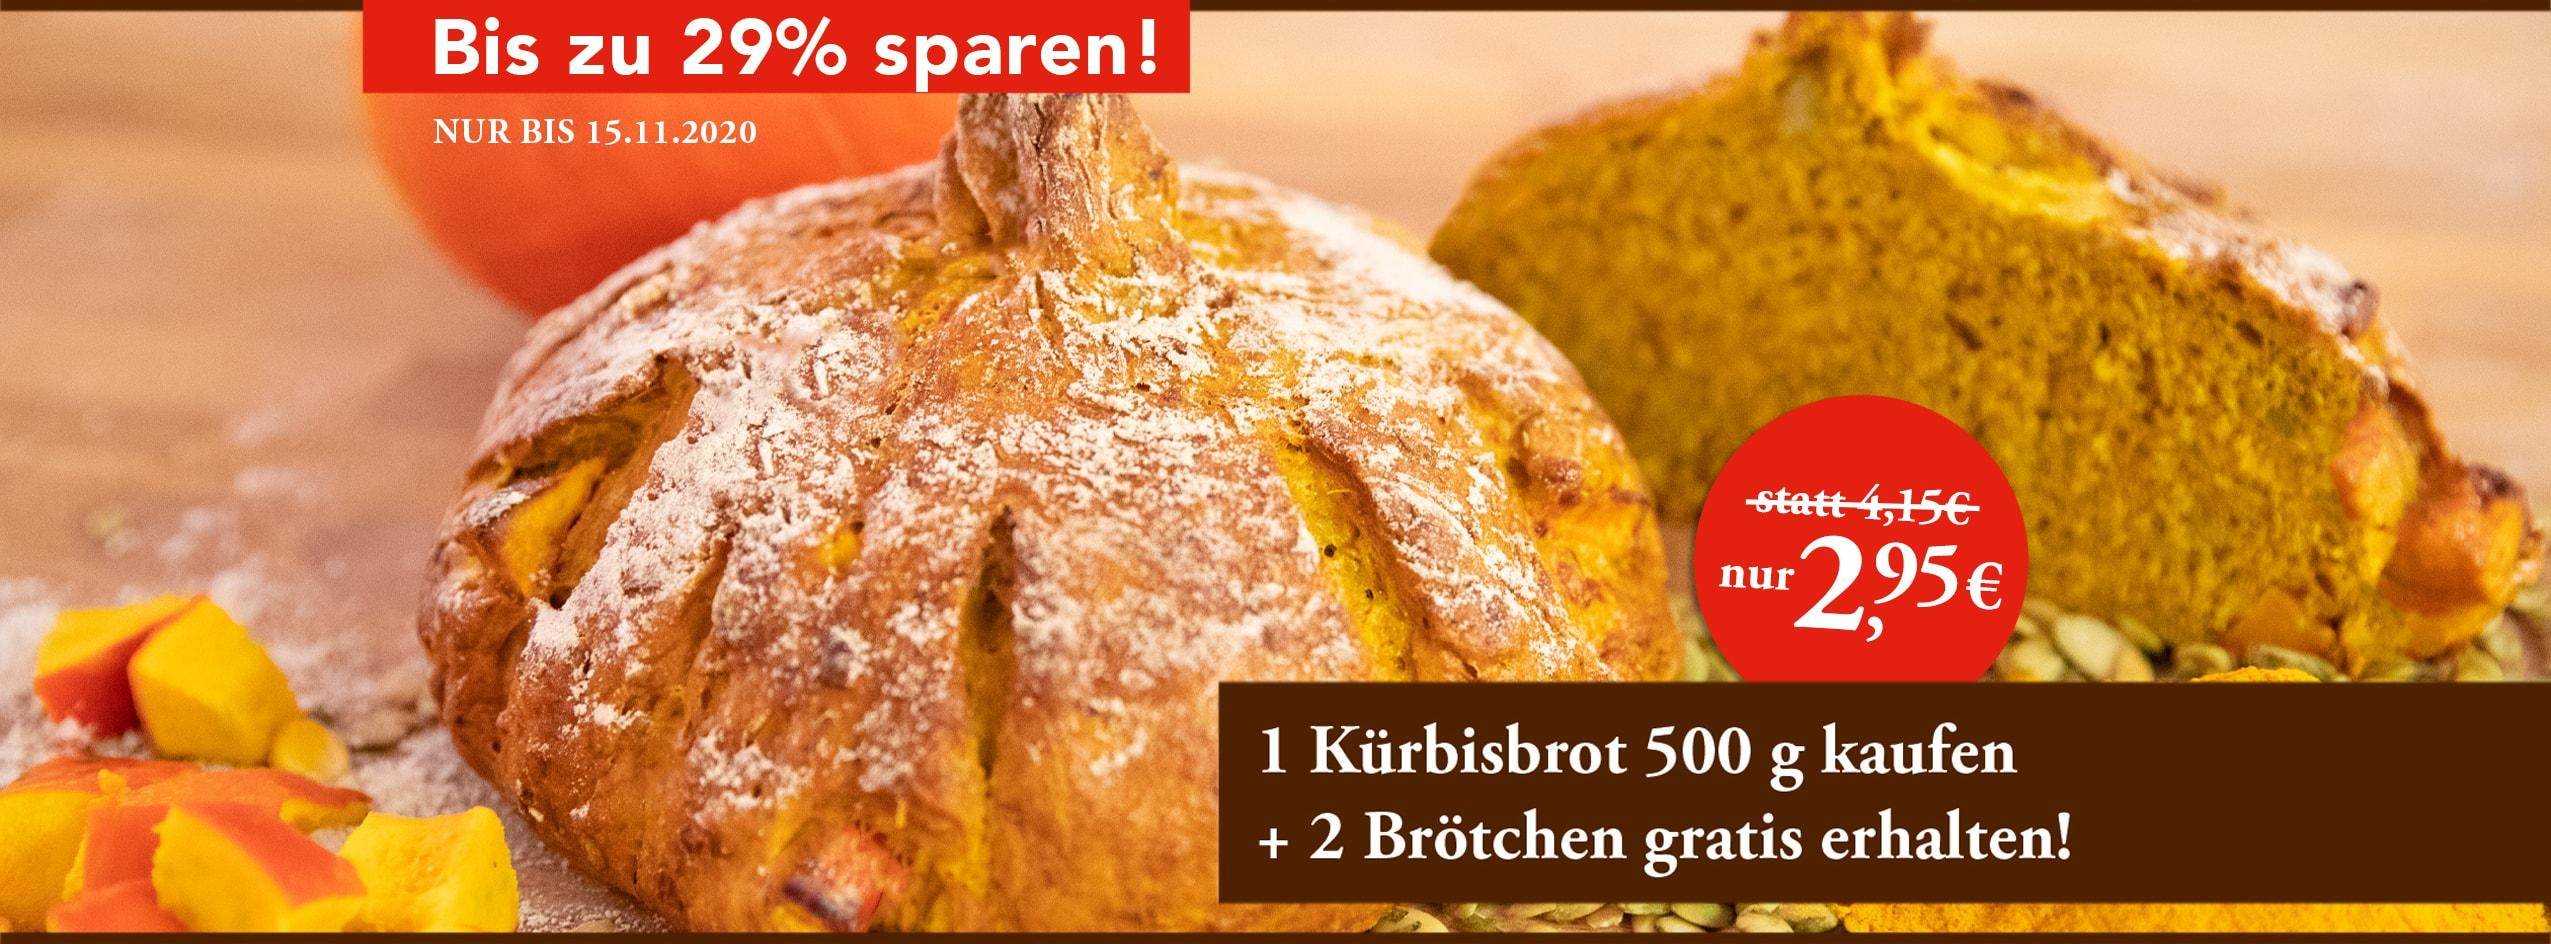 20200826_bw_webbanner-PC_kürbisbrot-min